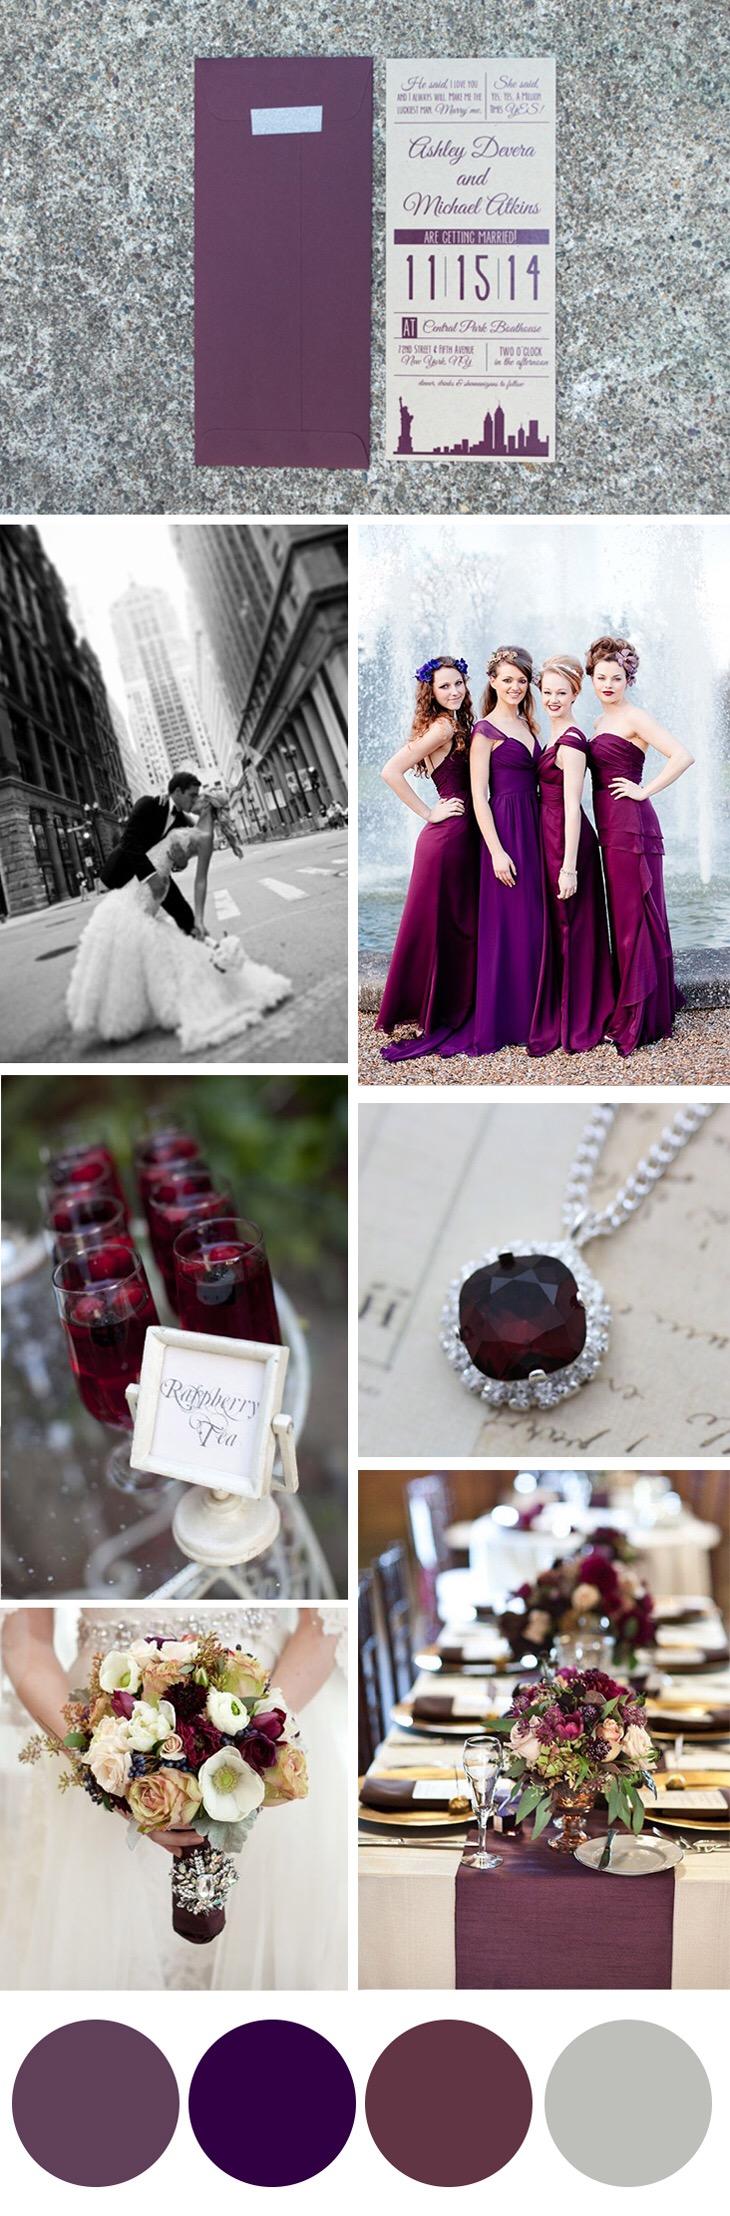 Pin von Katelynn White auf Wedding colors   Pinterest